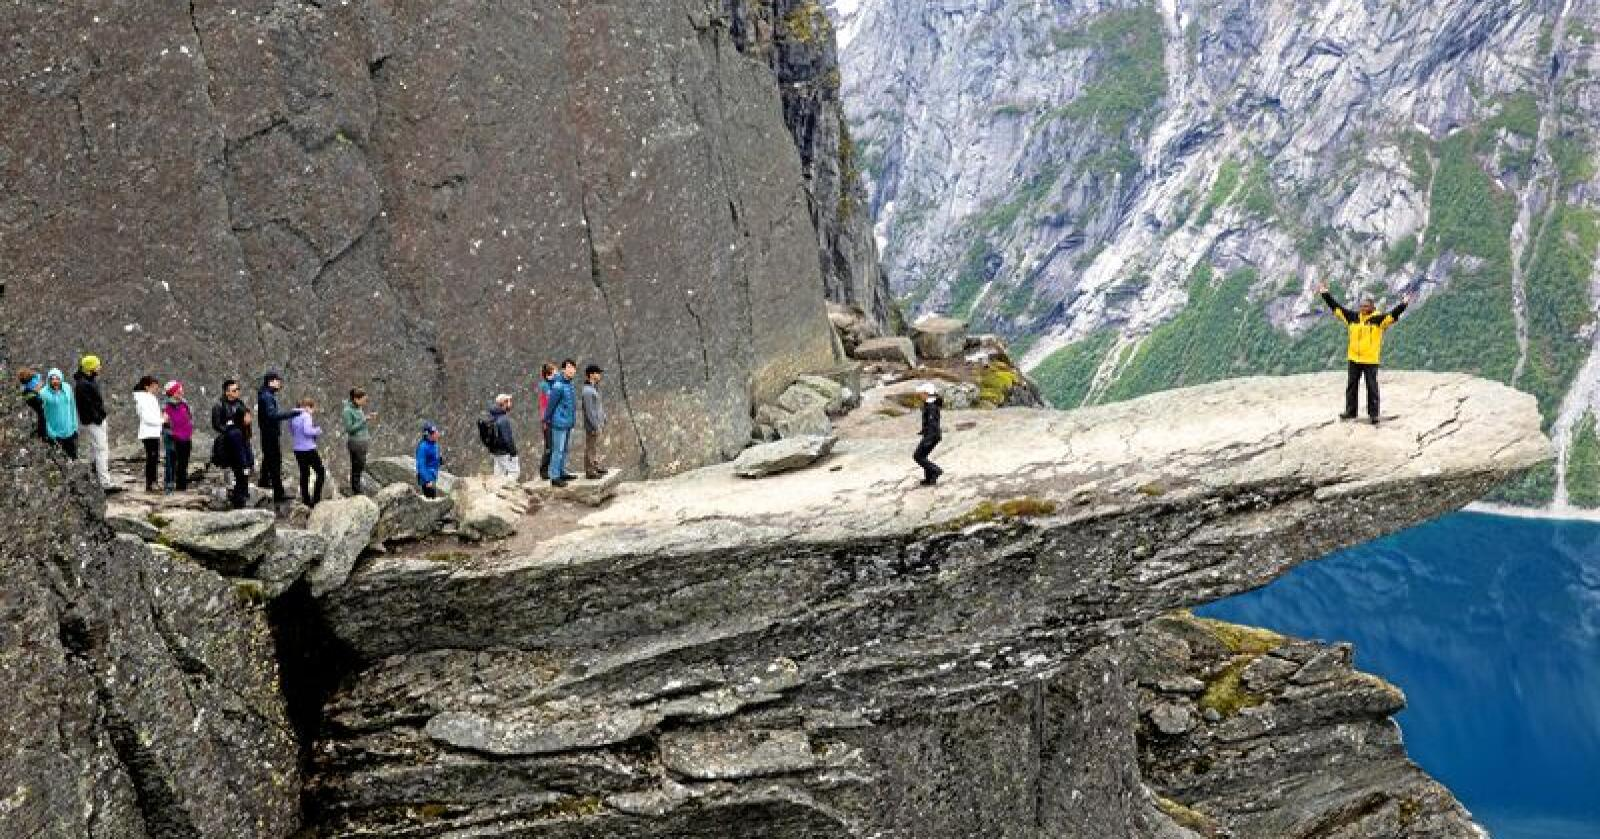 Reiseliv: Selfie-turistene strømmer til Trolltunga og andre destinasjoner i Fjord-Norge . Foto: Tore Meek / NTB scanpix